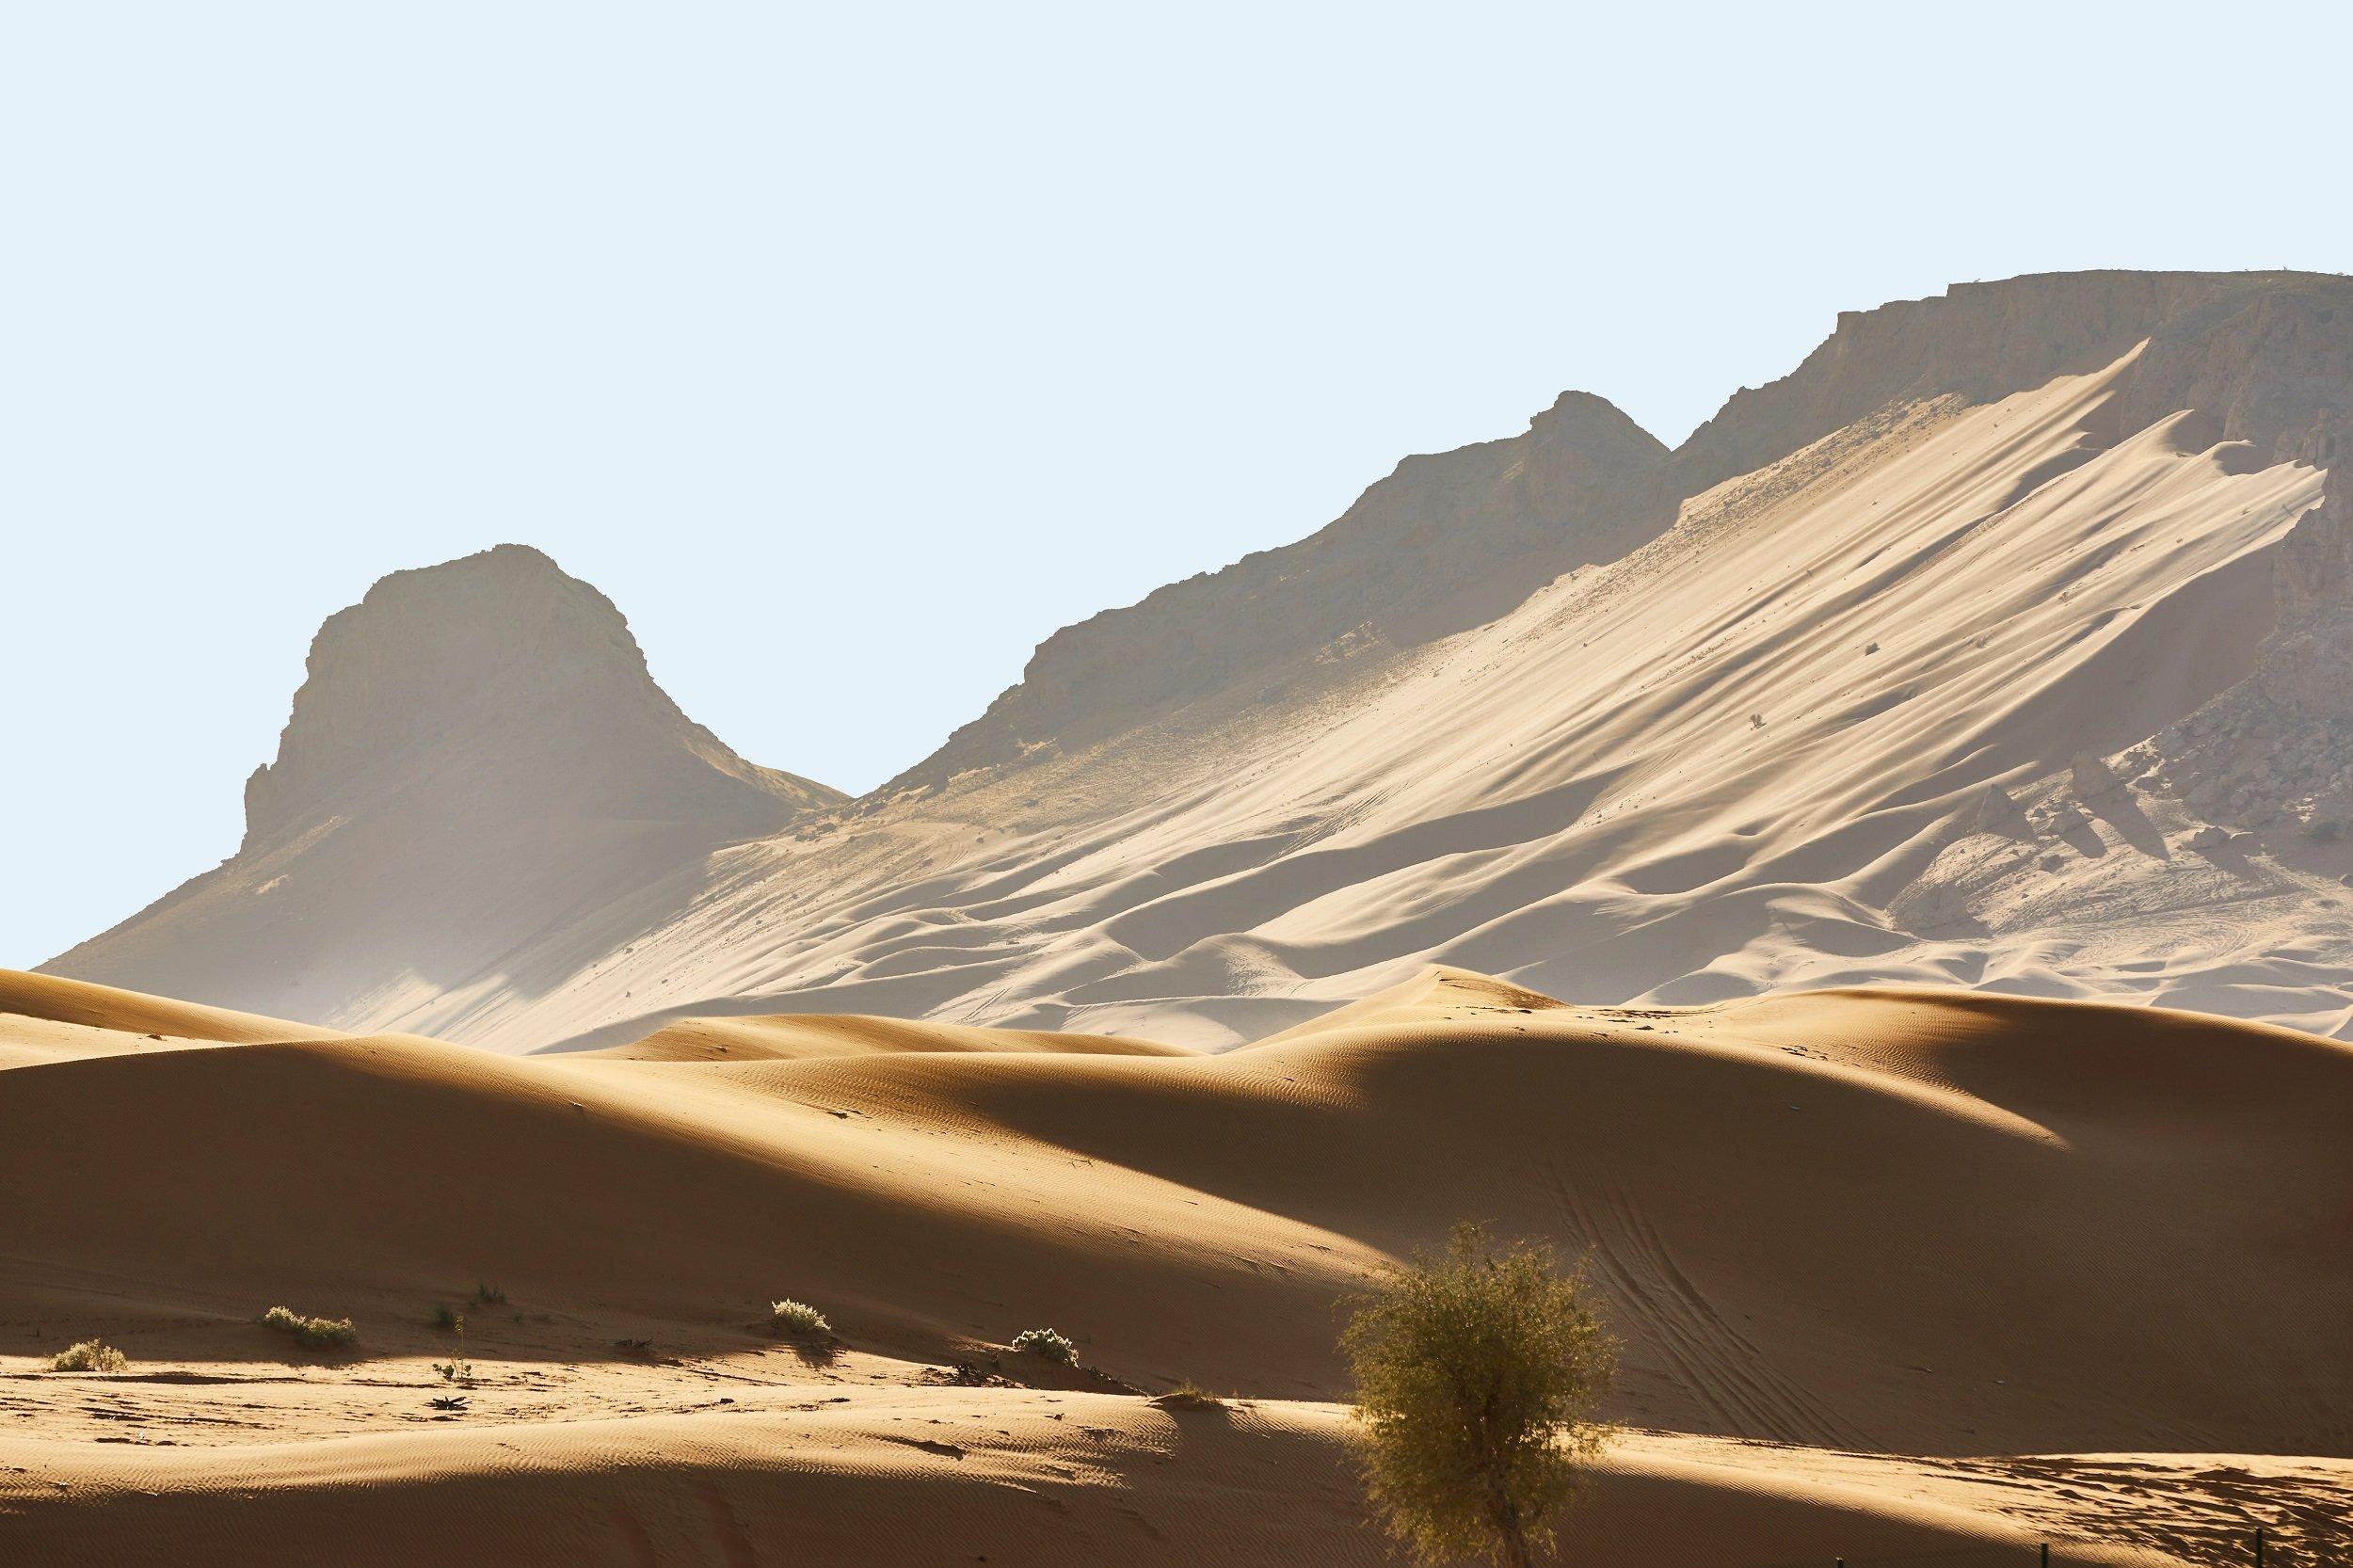 Hatta Mountain Safari Tour From Dubai